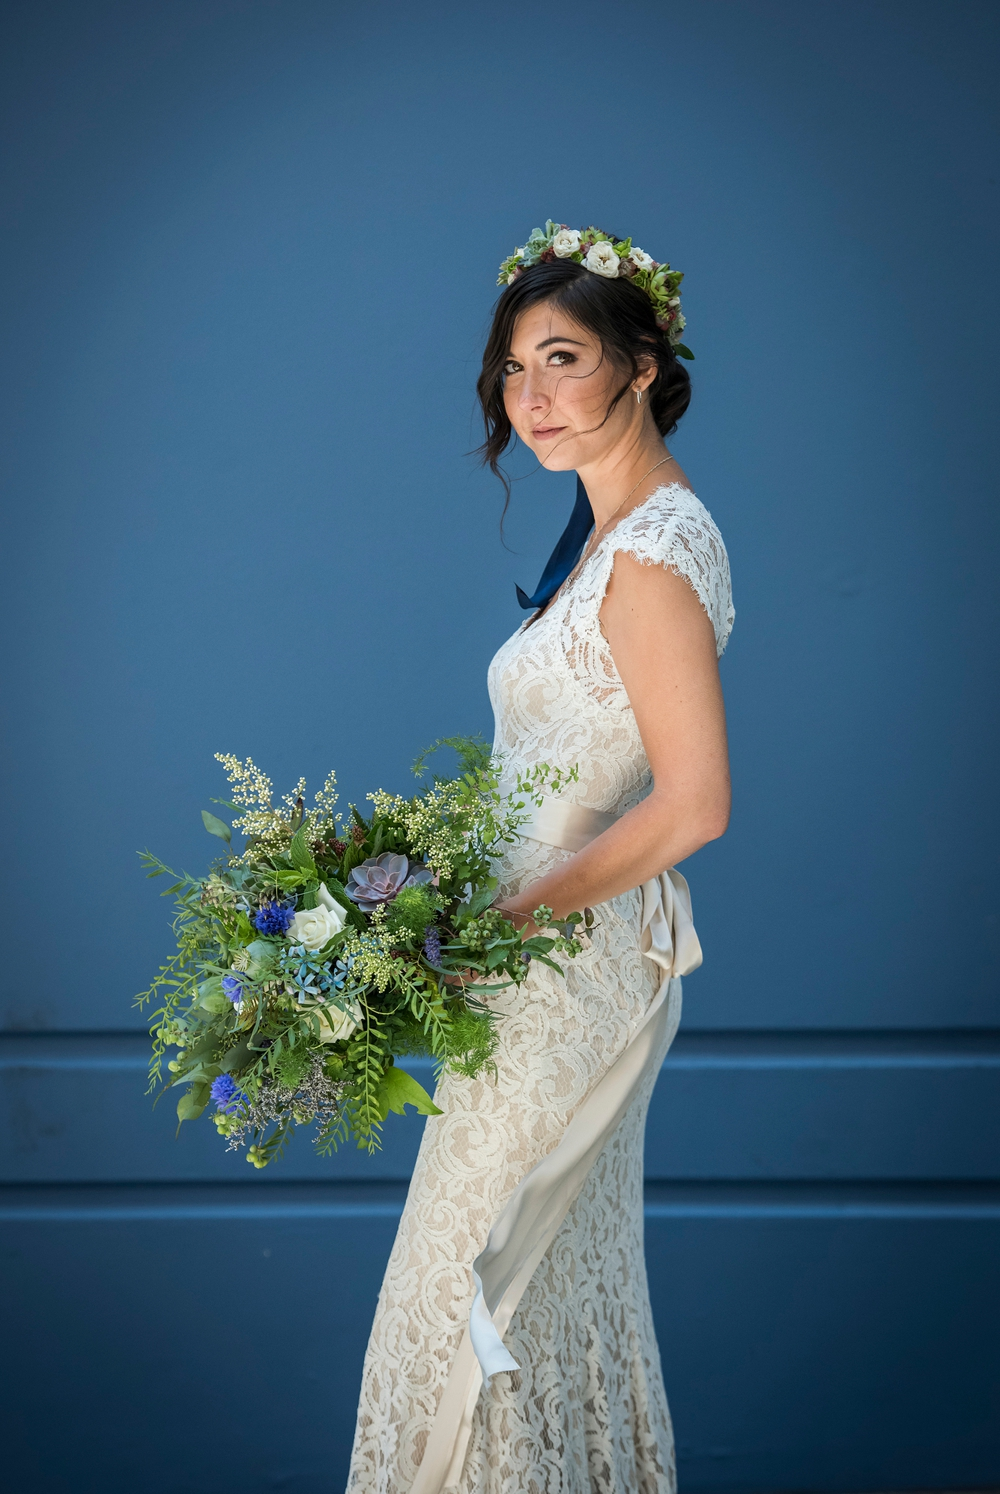 PNW-ferns-at-fremont-foundry-wedding-florist 5.jpg